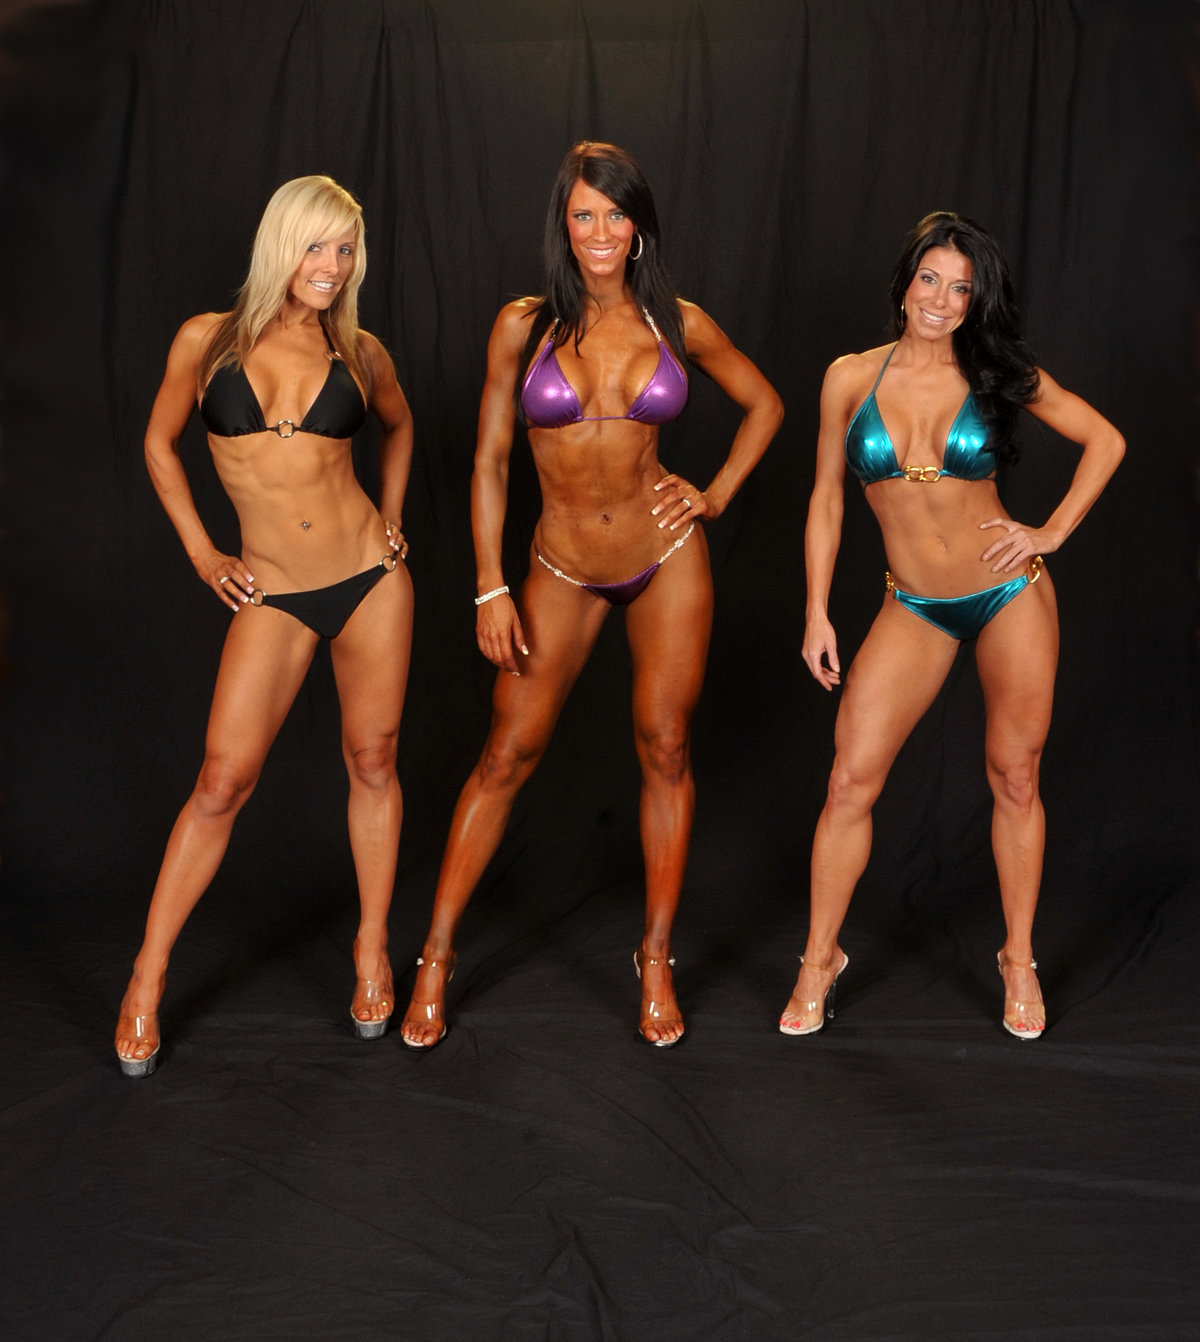 Bikini fitness girls model contest 13